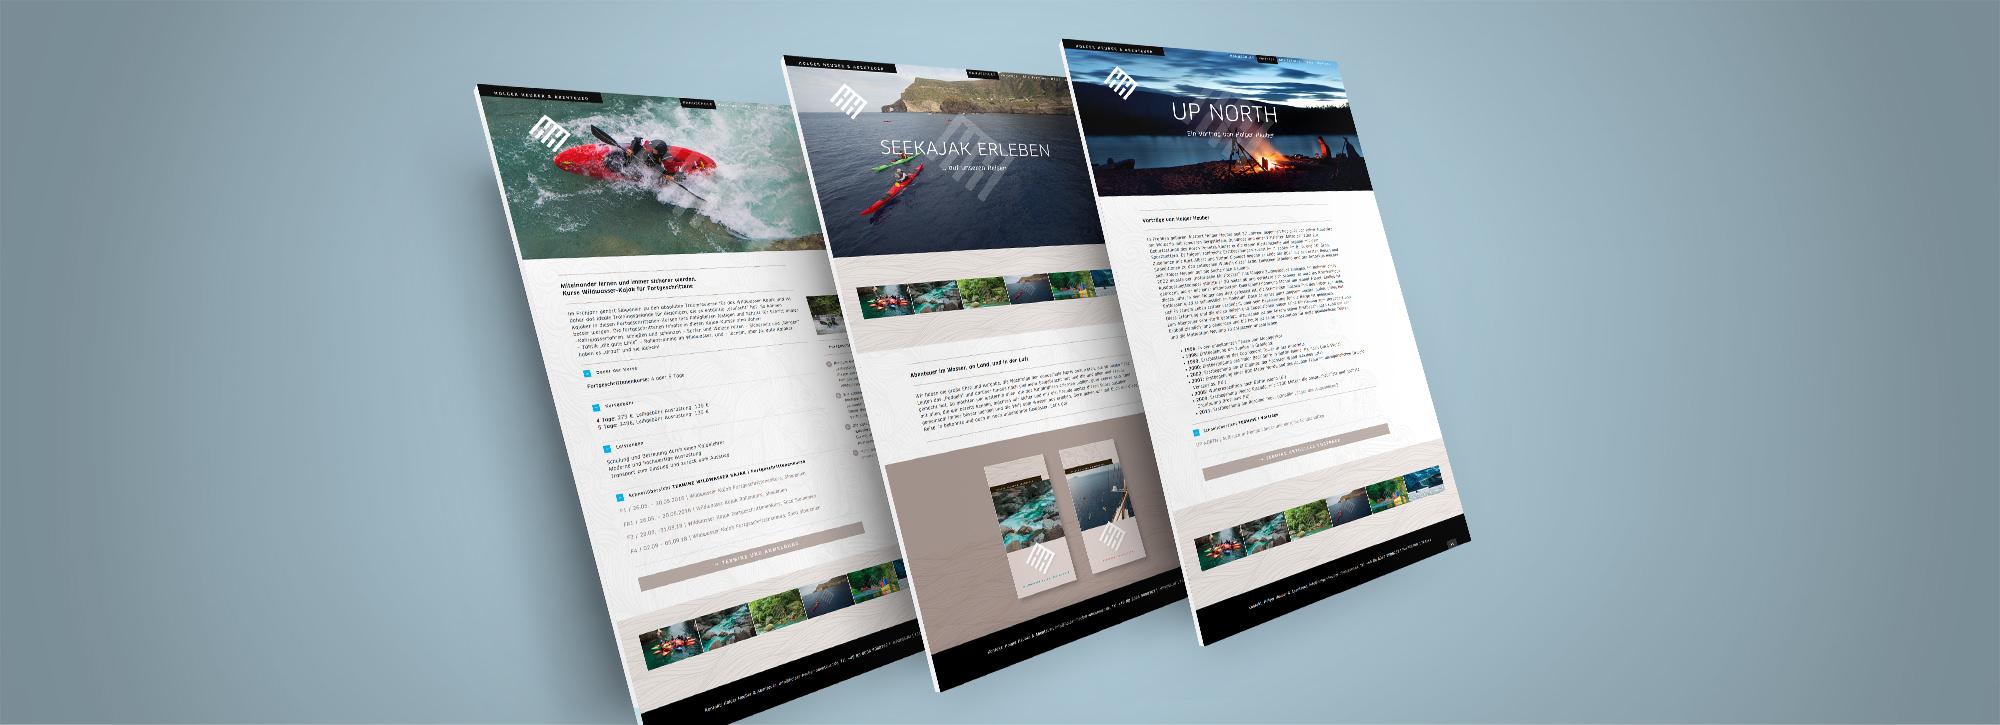 webdesign-holger-heuber-abenteuer